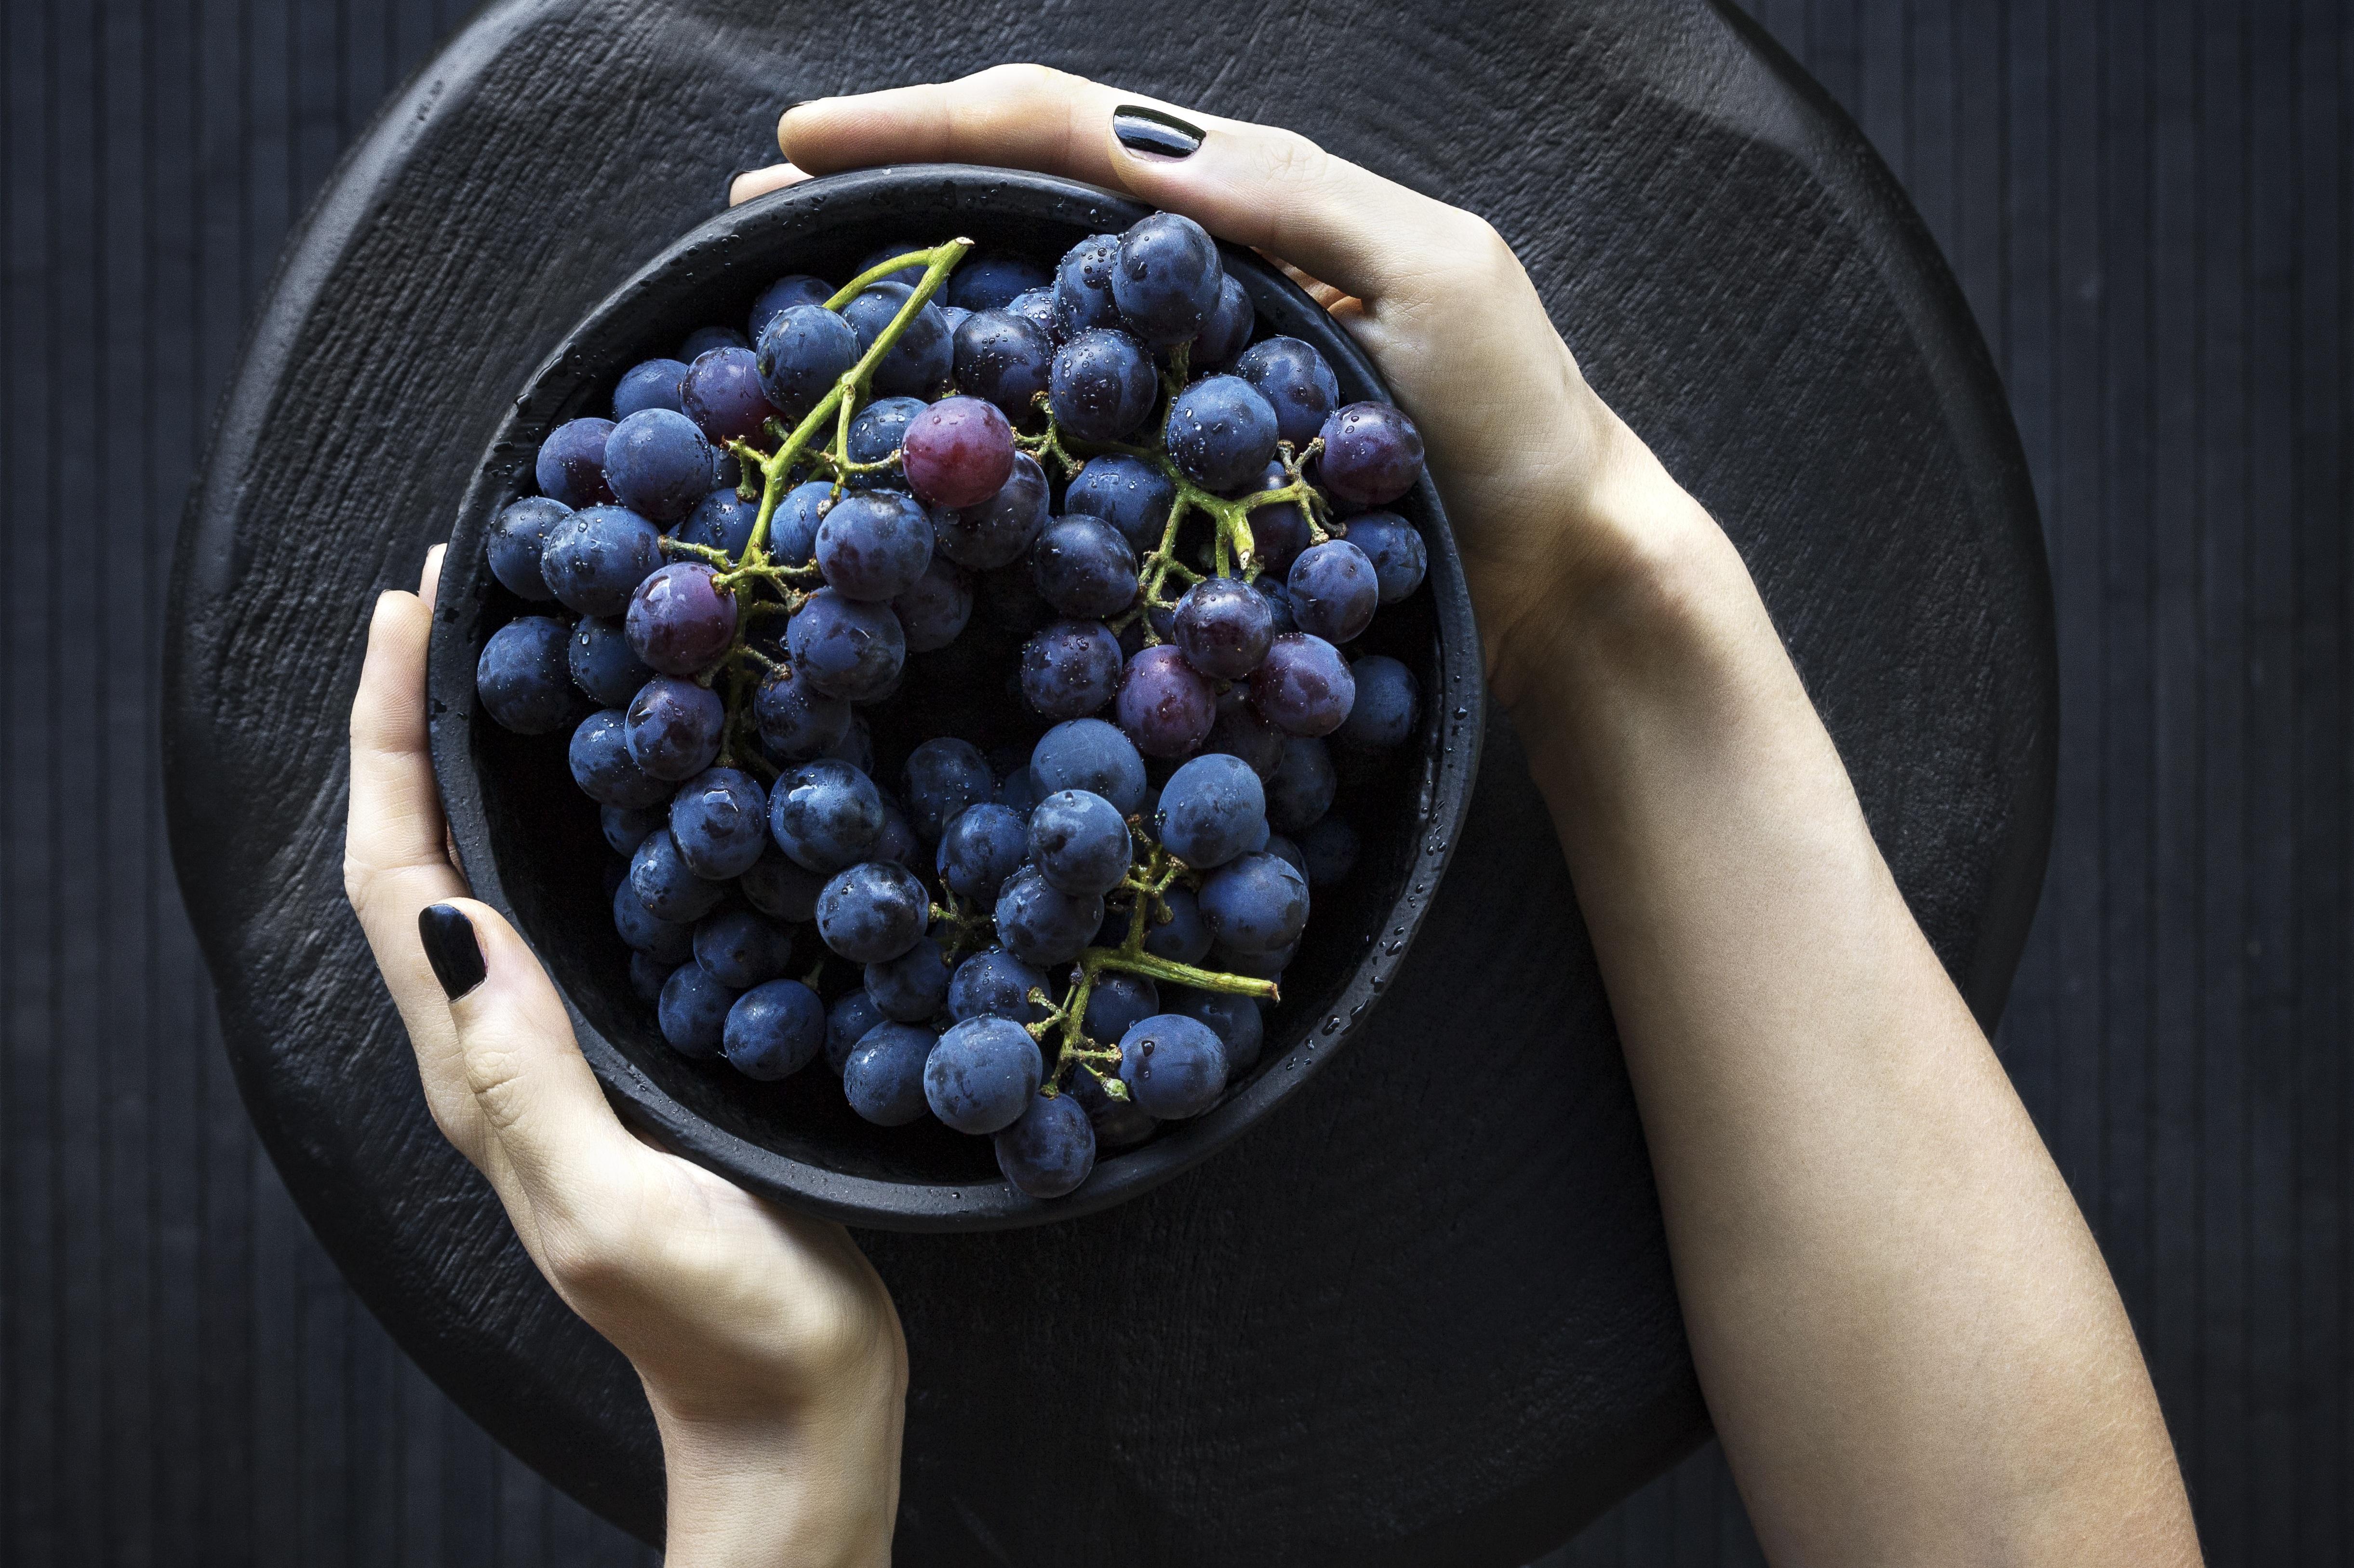 Free Images : grape, fruit, berry, flower, dark, food, produce, blue ...